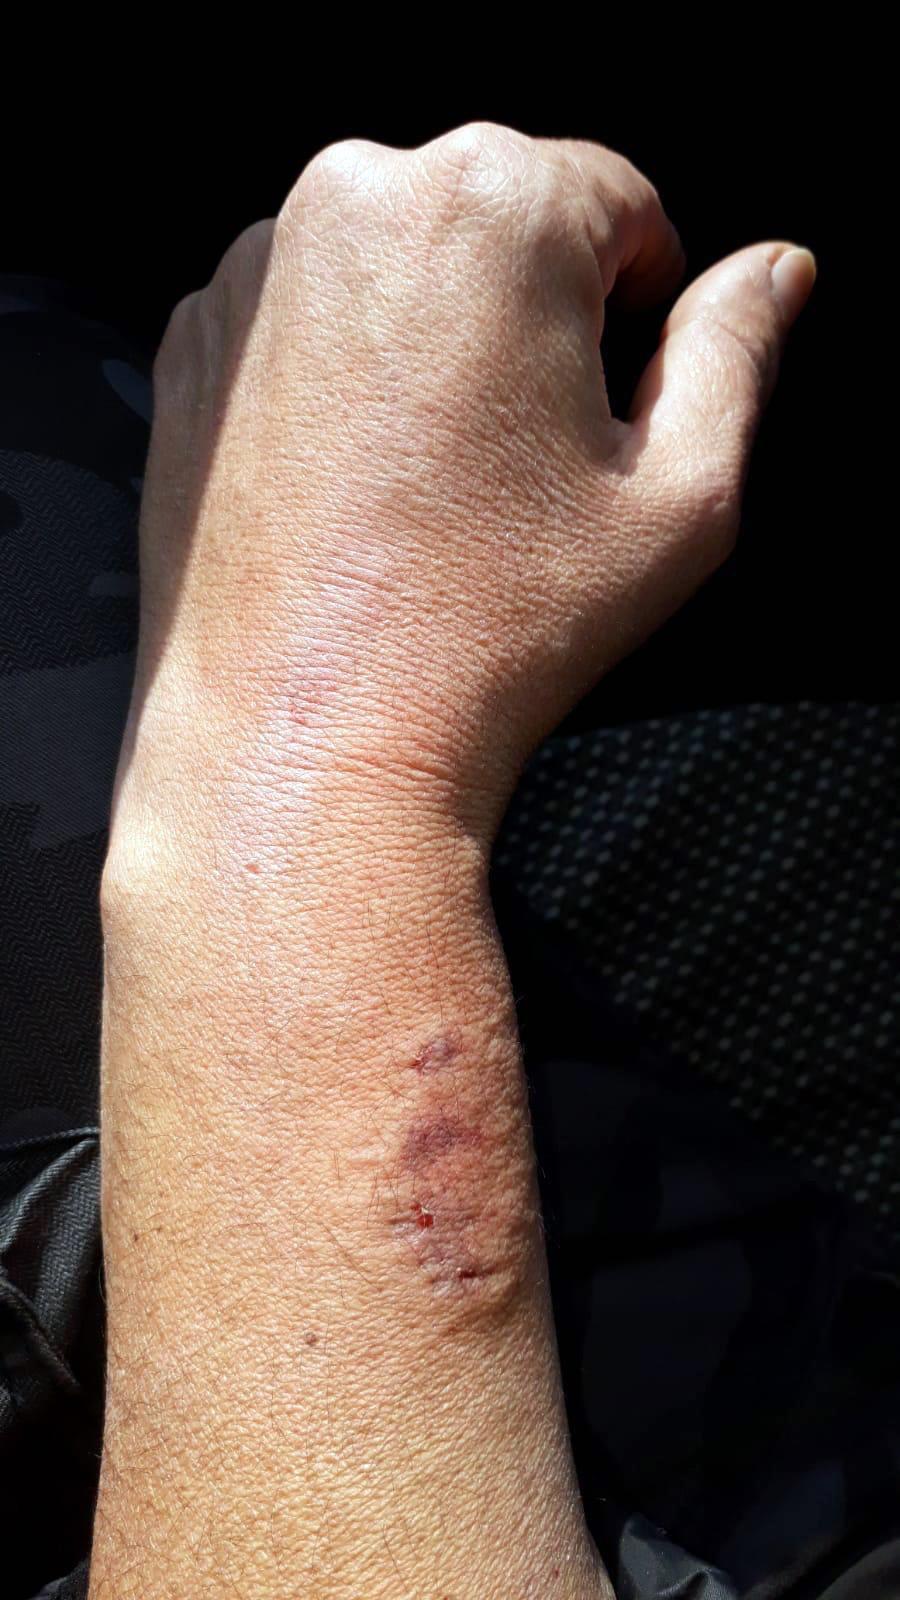 HDP'li vekil polisin kolunu ısırdı